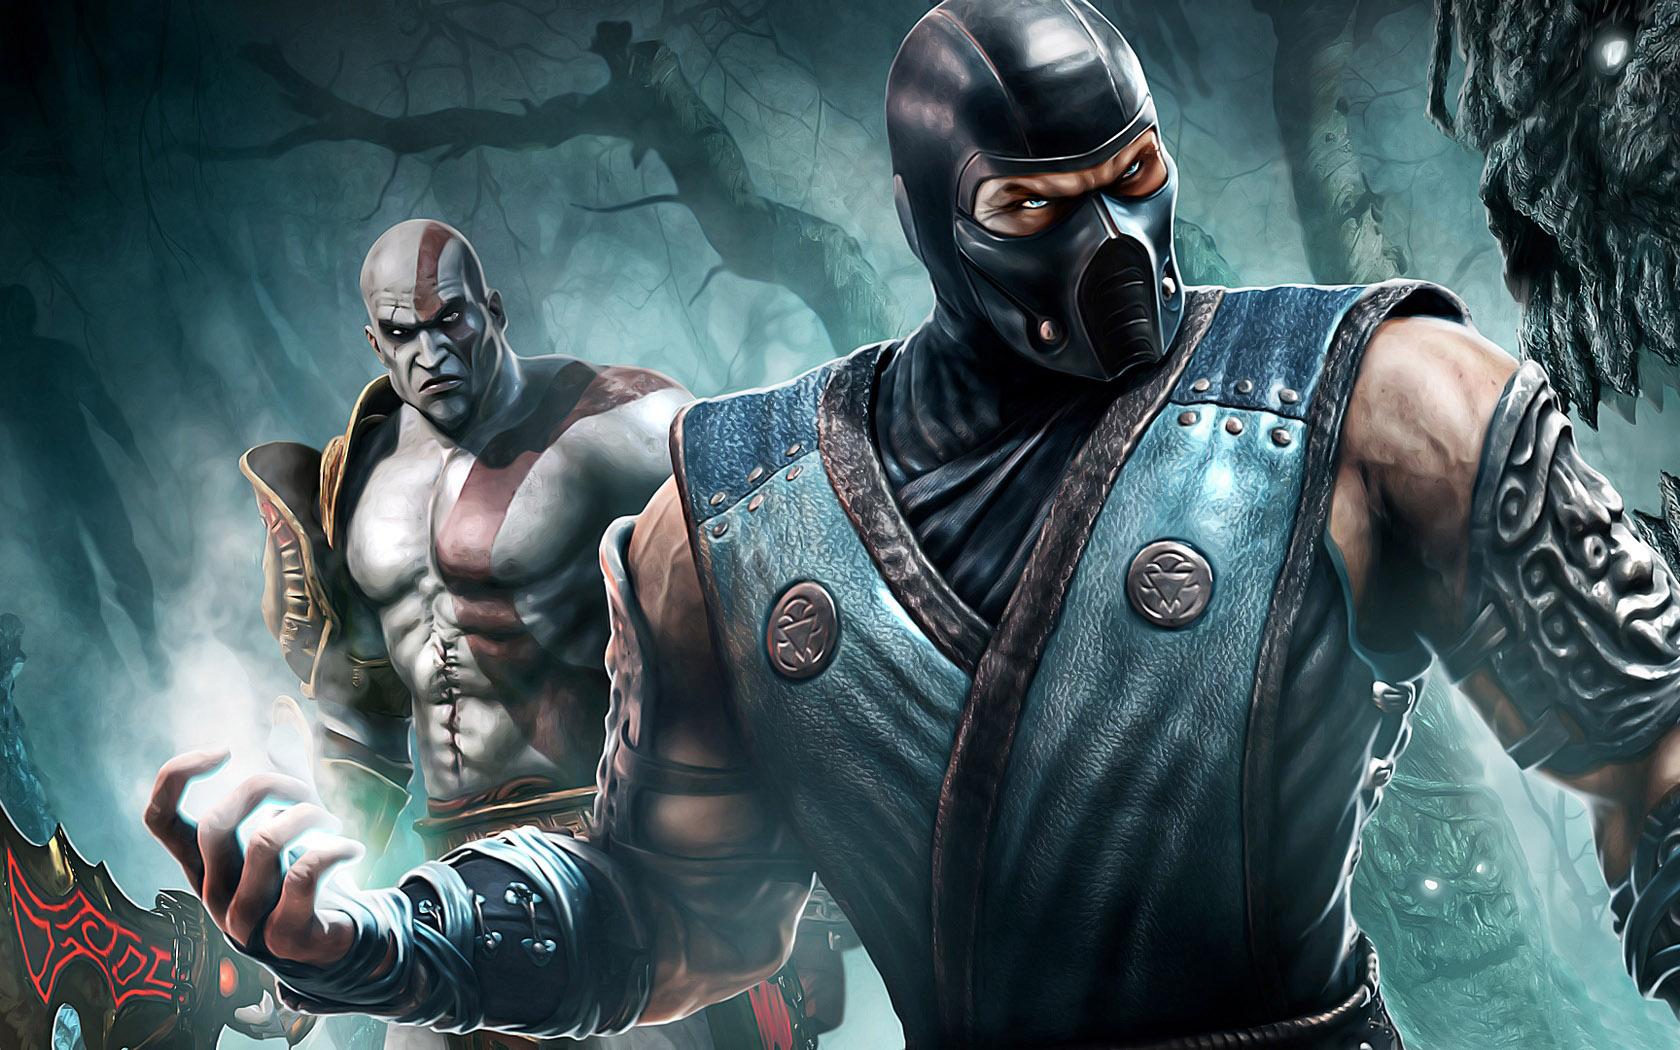 Sub-Ziro-and-Kratos-Mortal-Kombat-characters-hd-wallpapers